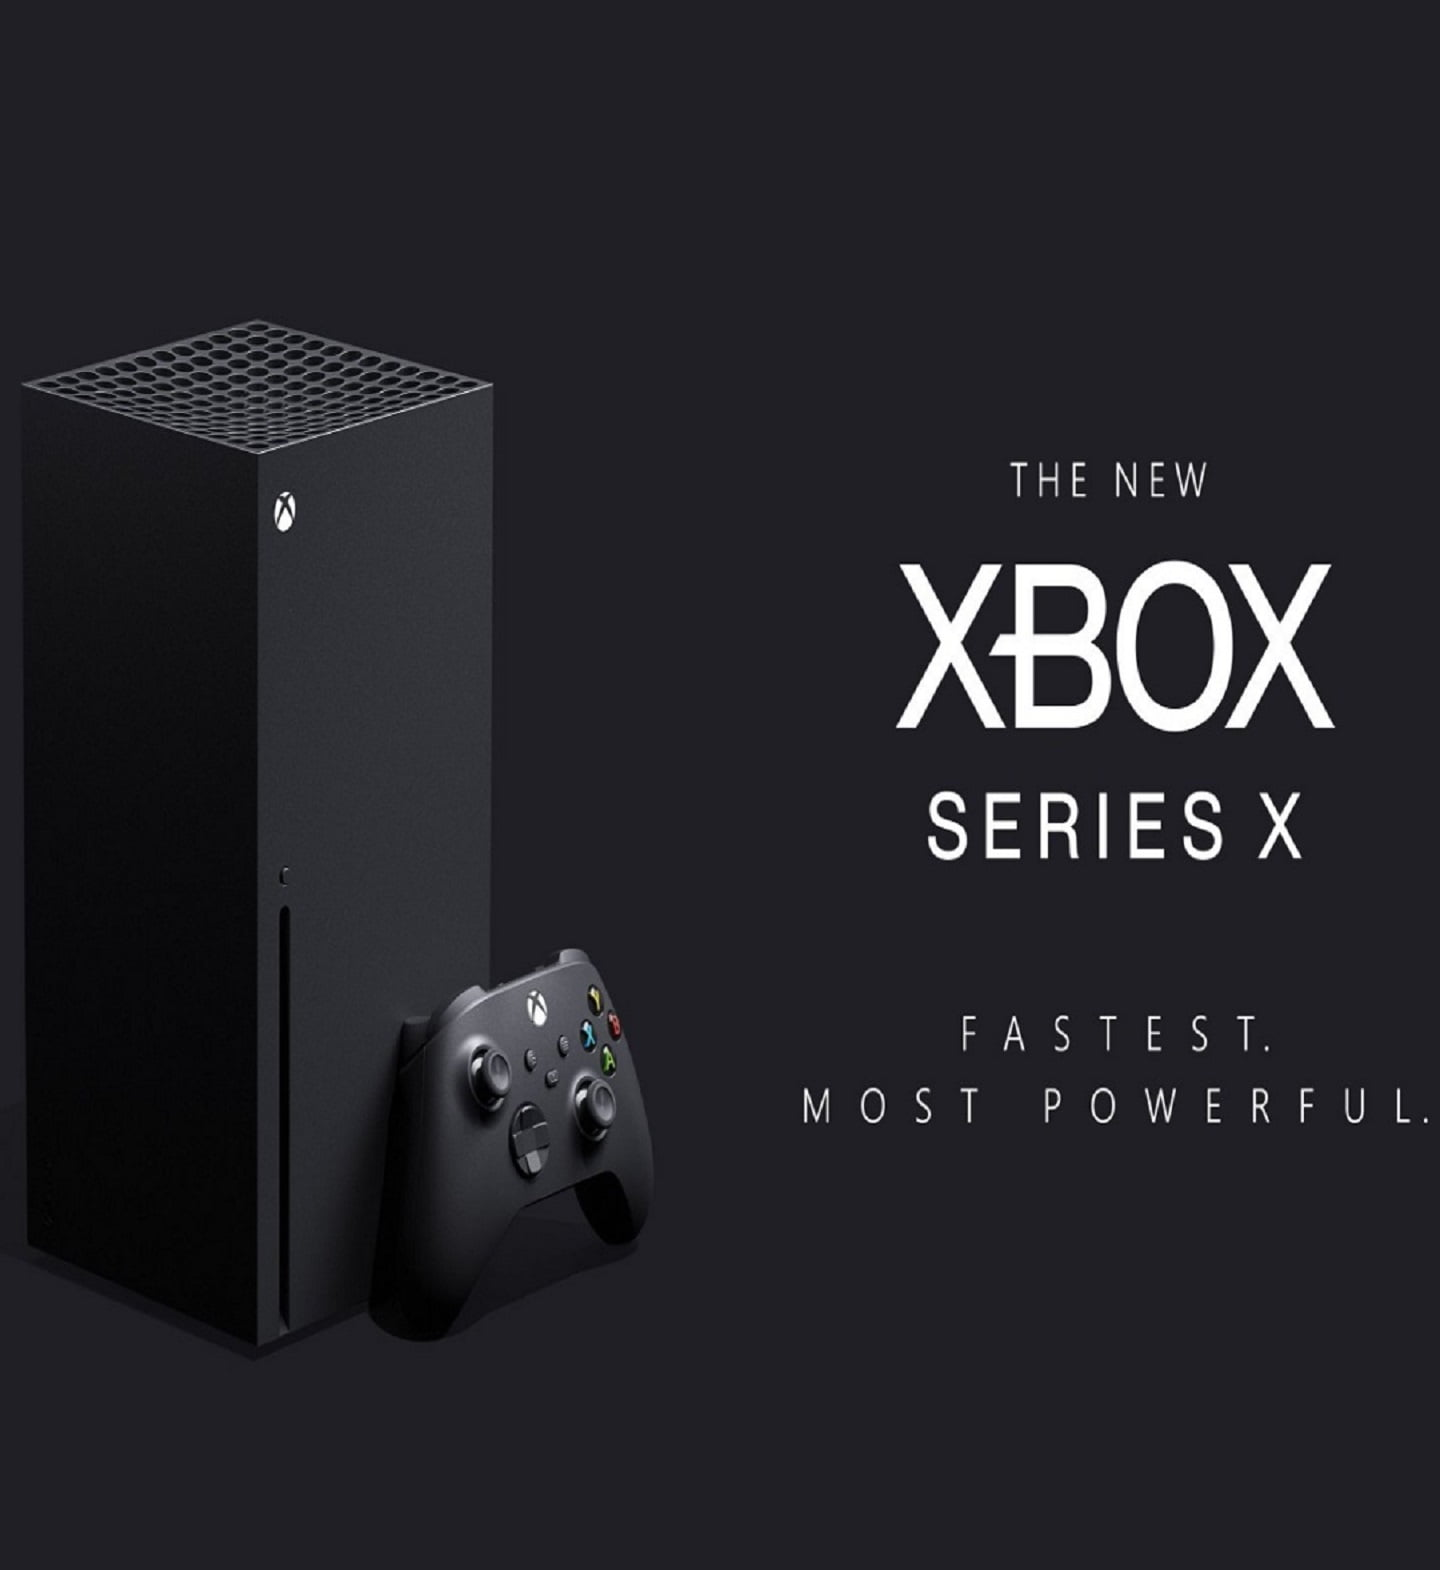 X-box Video Games in edmonton